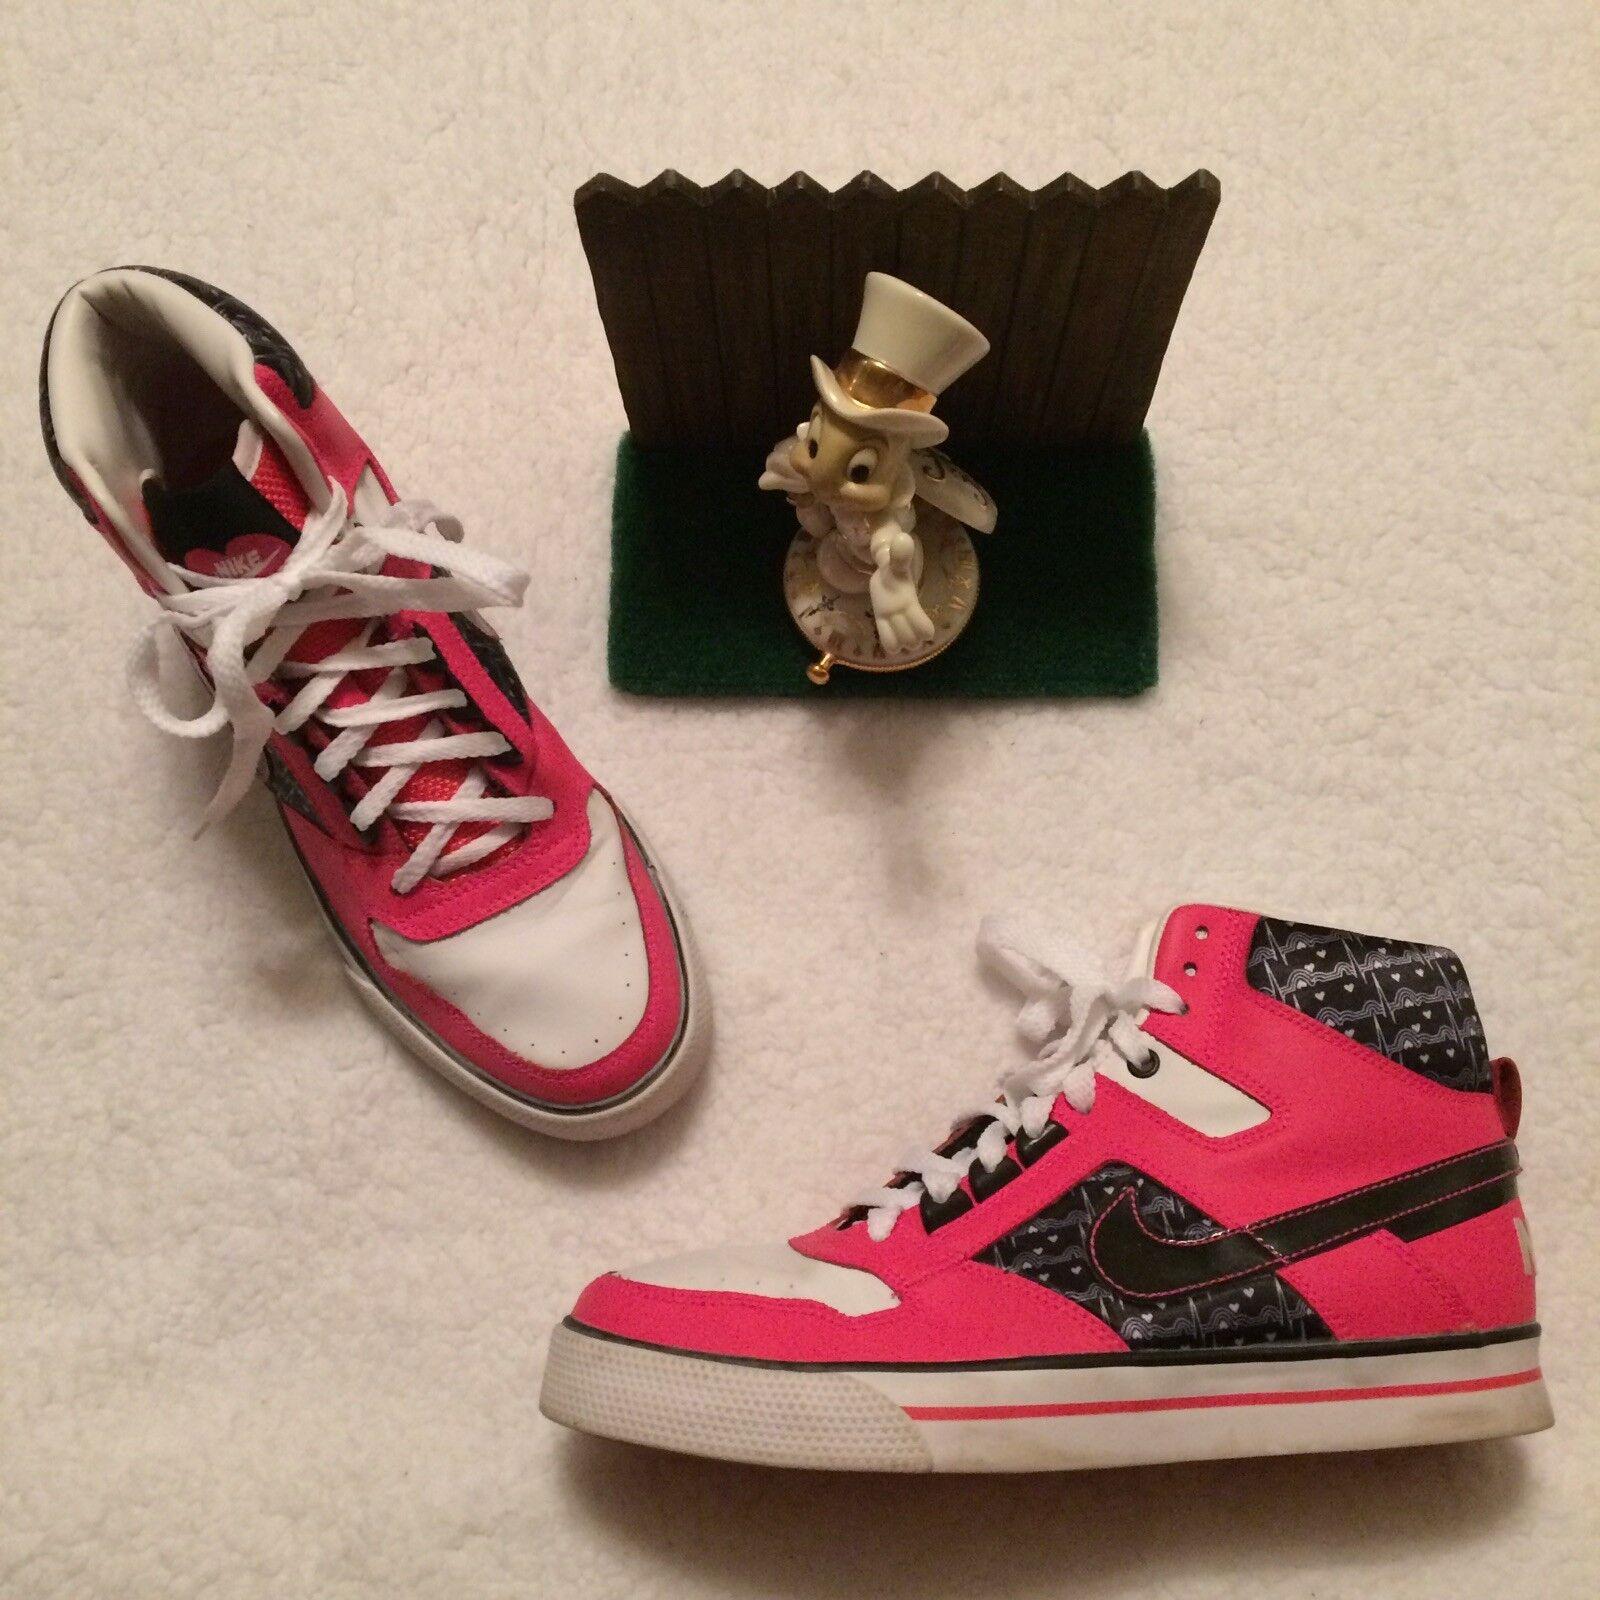 sports shoes 59576 248b0 Nike Delta Force shoes Sneakers Womens 39 386200-601 Pink Black Minimal  Wear 8 npgbmp7422-Women s Trainers